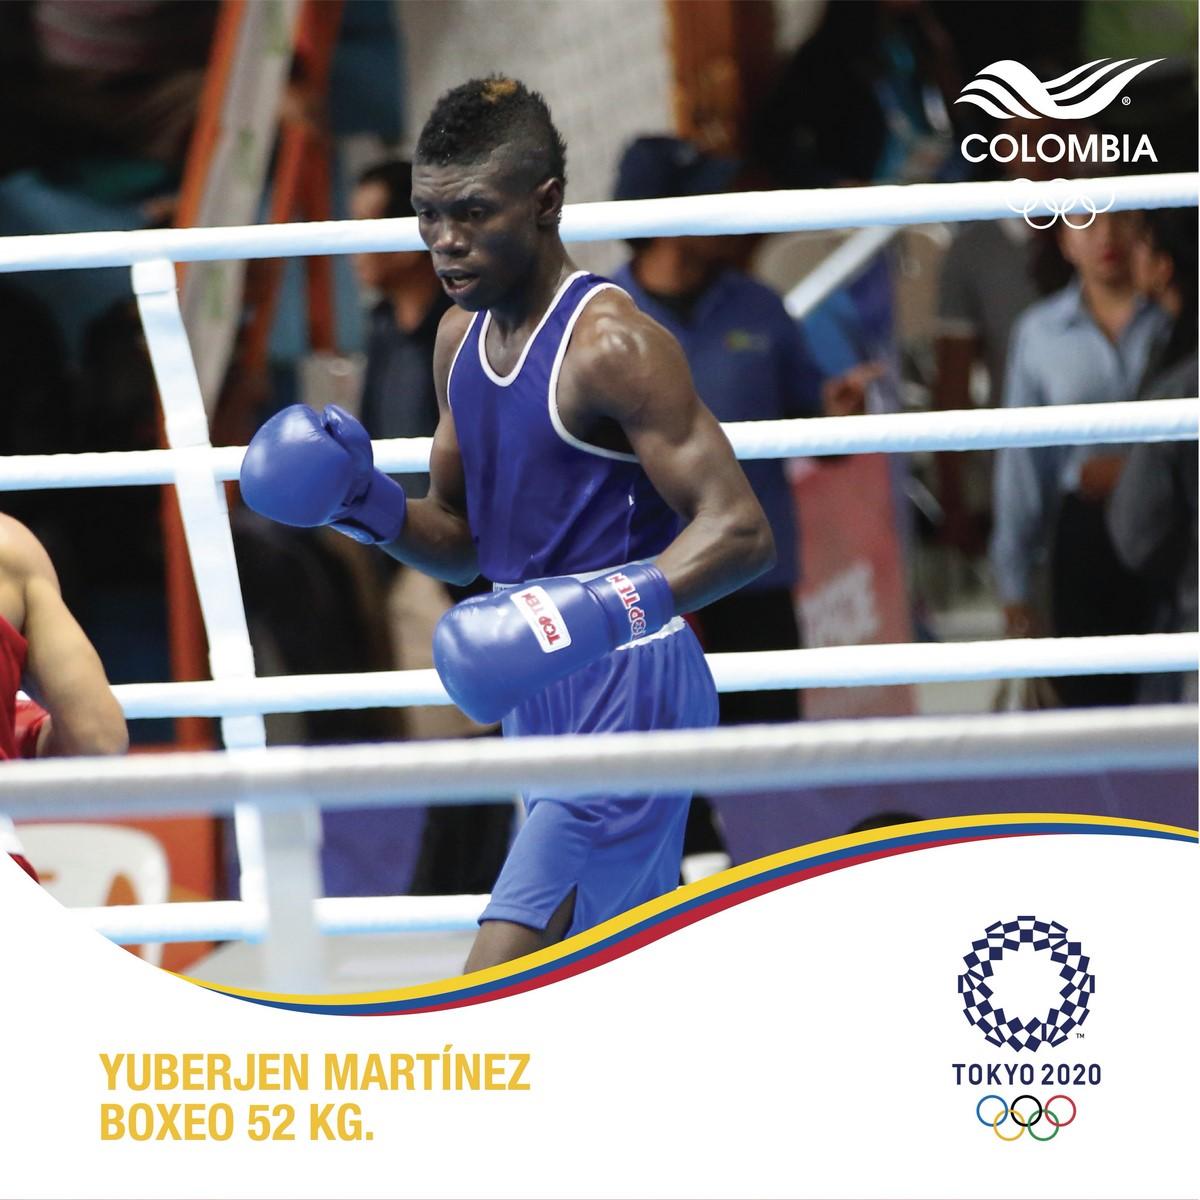 Boxeador Yuberjen Martinez Copiar